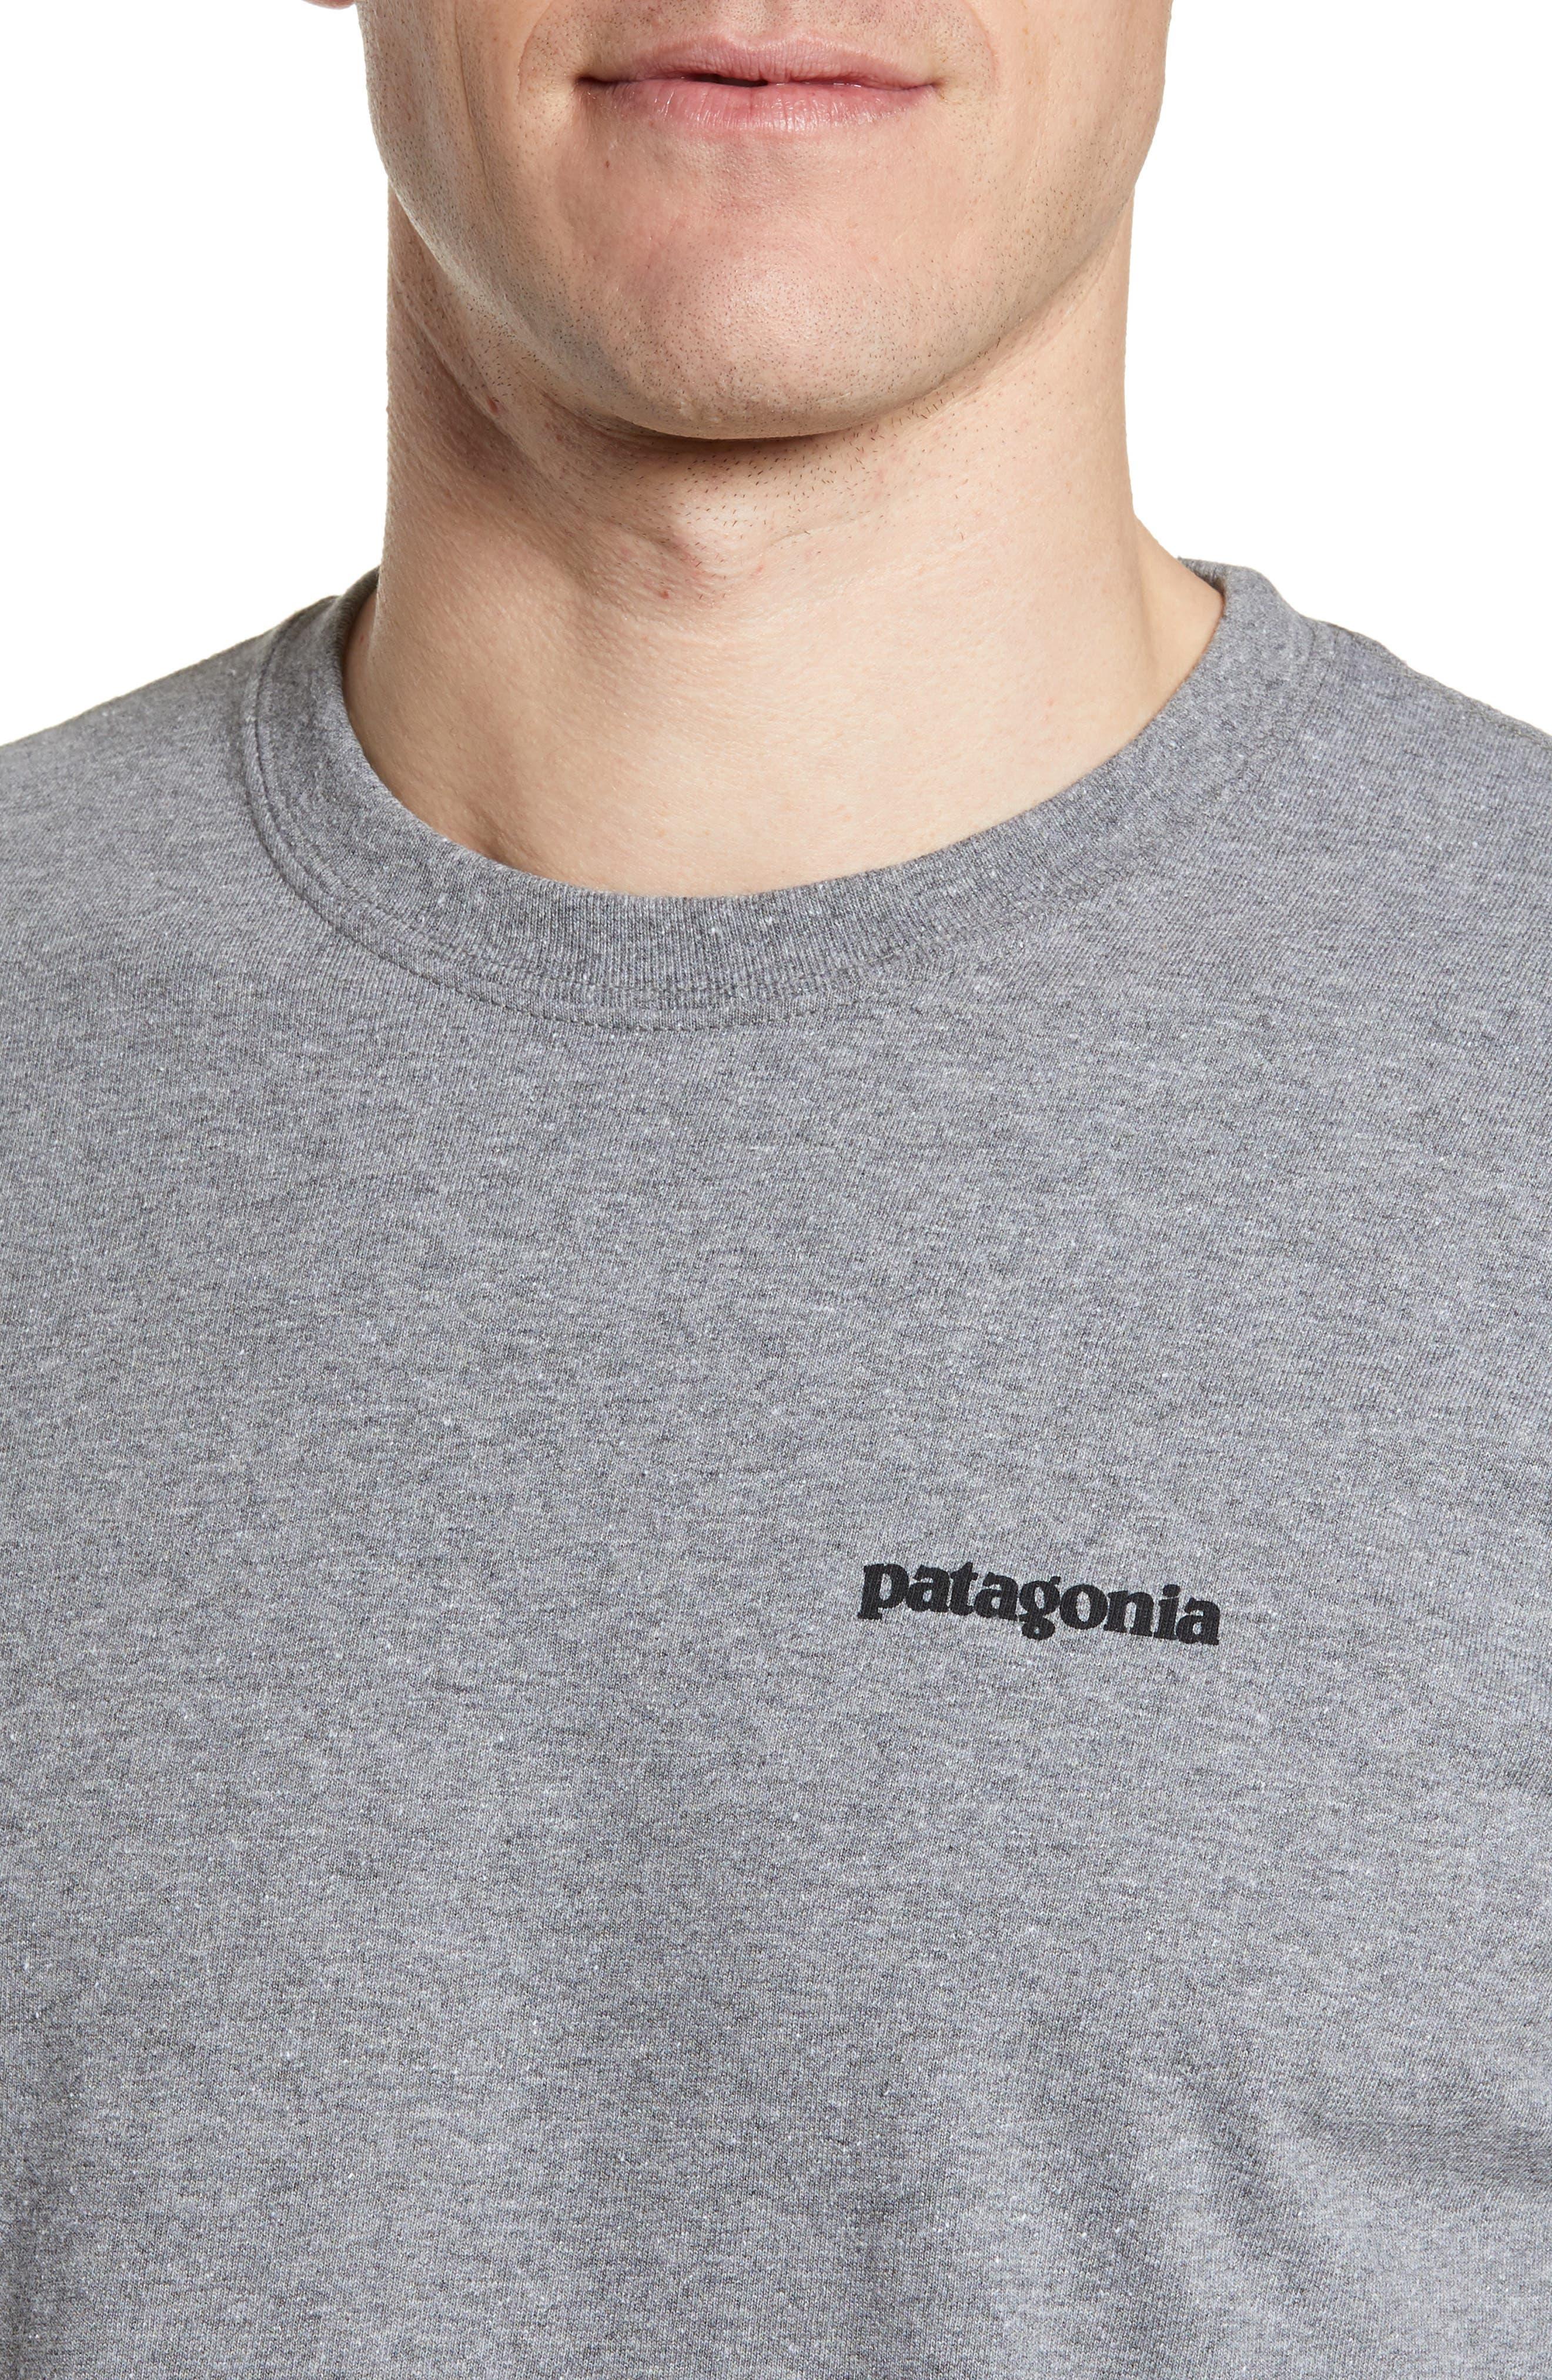 PATAGONIA,                             Fitz Roy Trout Crewneck T-Shirt,                             Alternate thumbnail 4, color,                             GRAVEL HEATHER